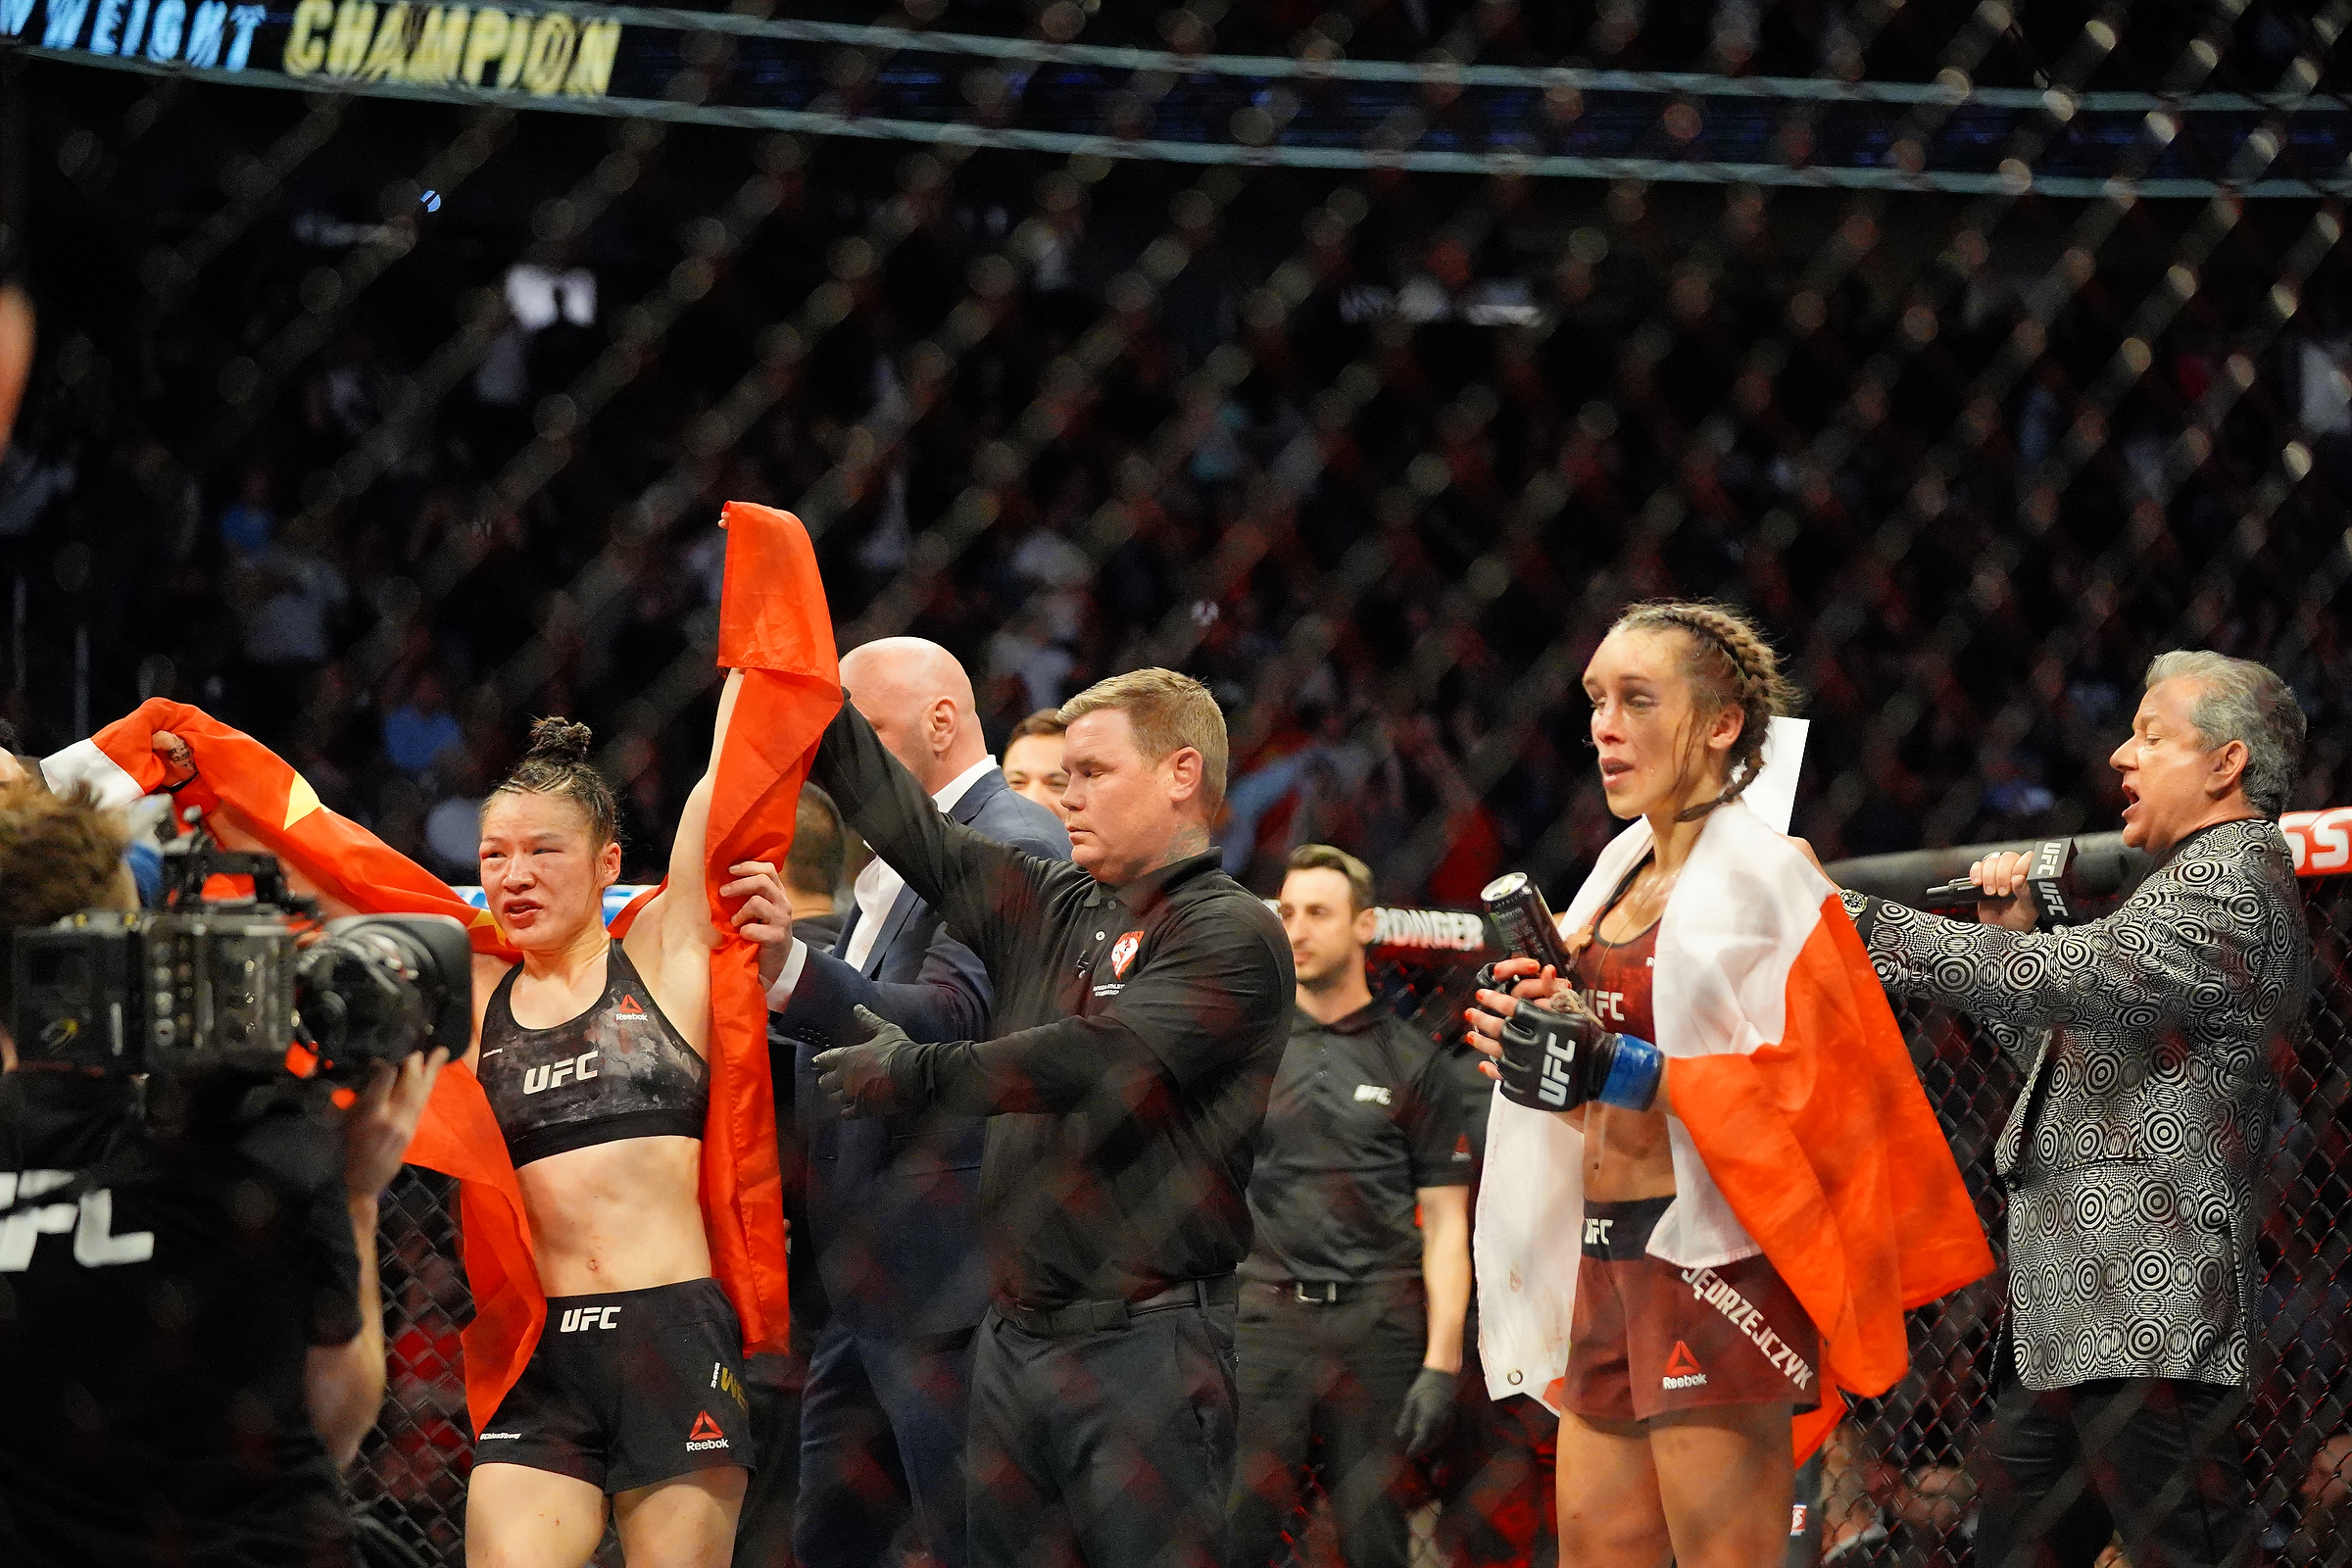 MMA: MAR 07 UFC 248